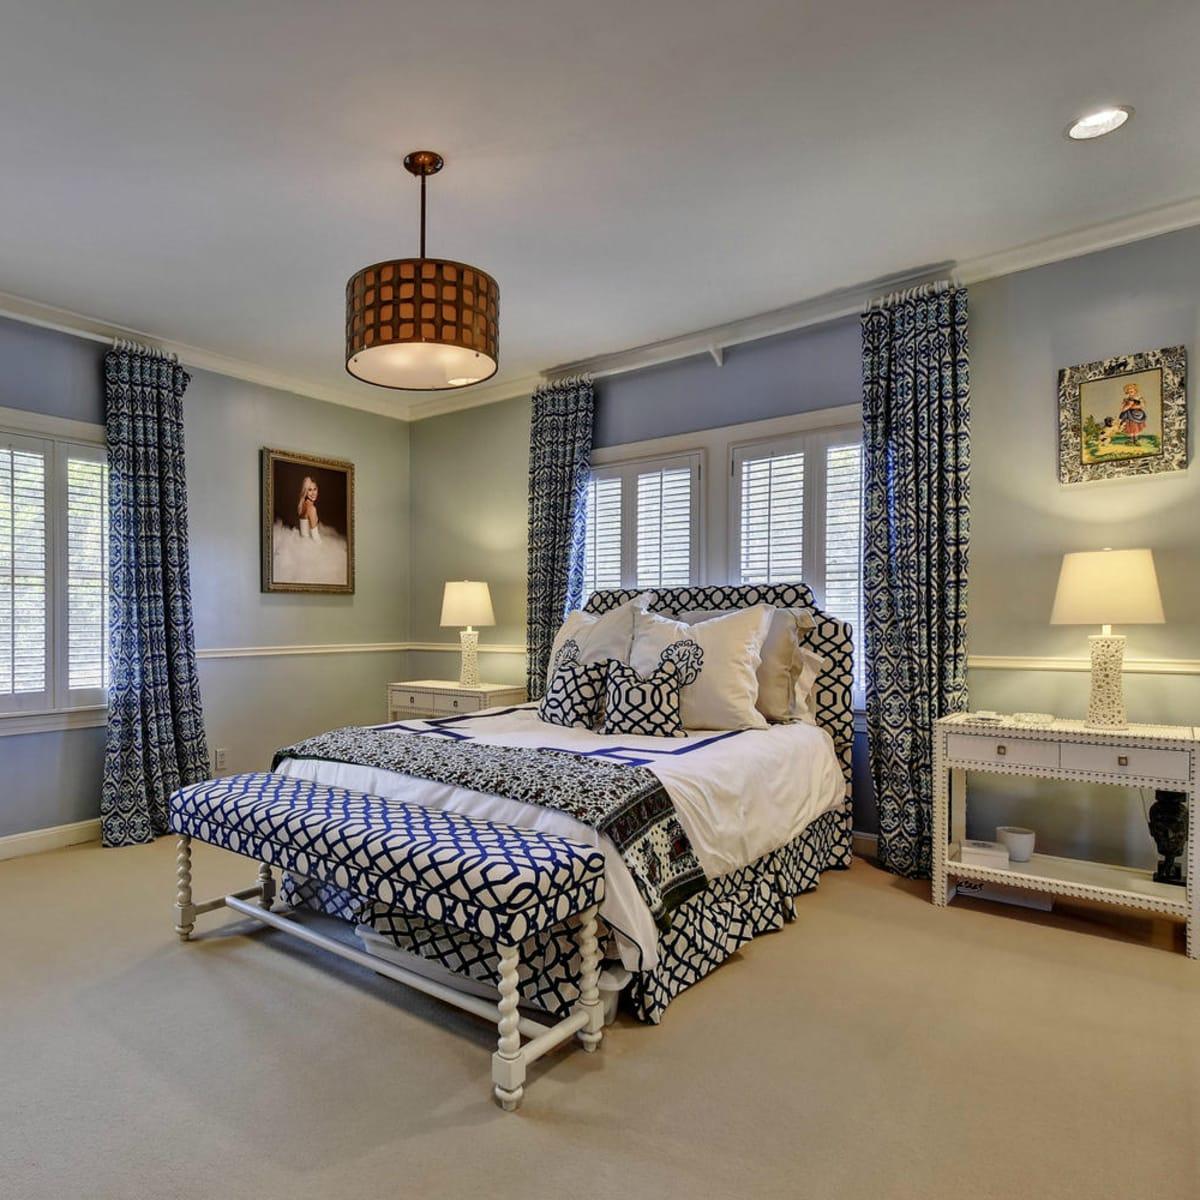 Austin house home Tarrytown 2610 Kenmore Court Ben Crenshaw February 2016 bedroom